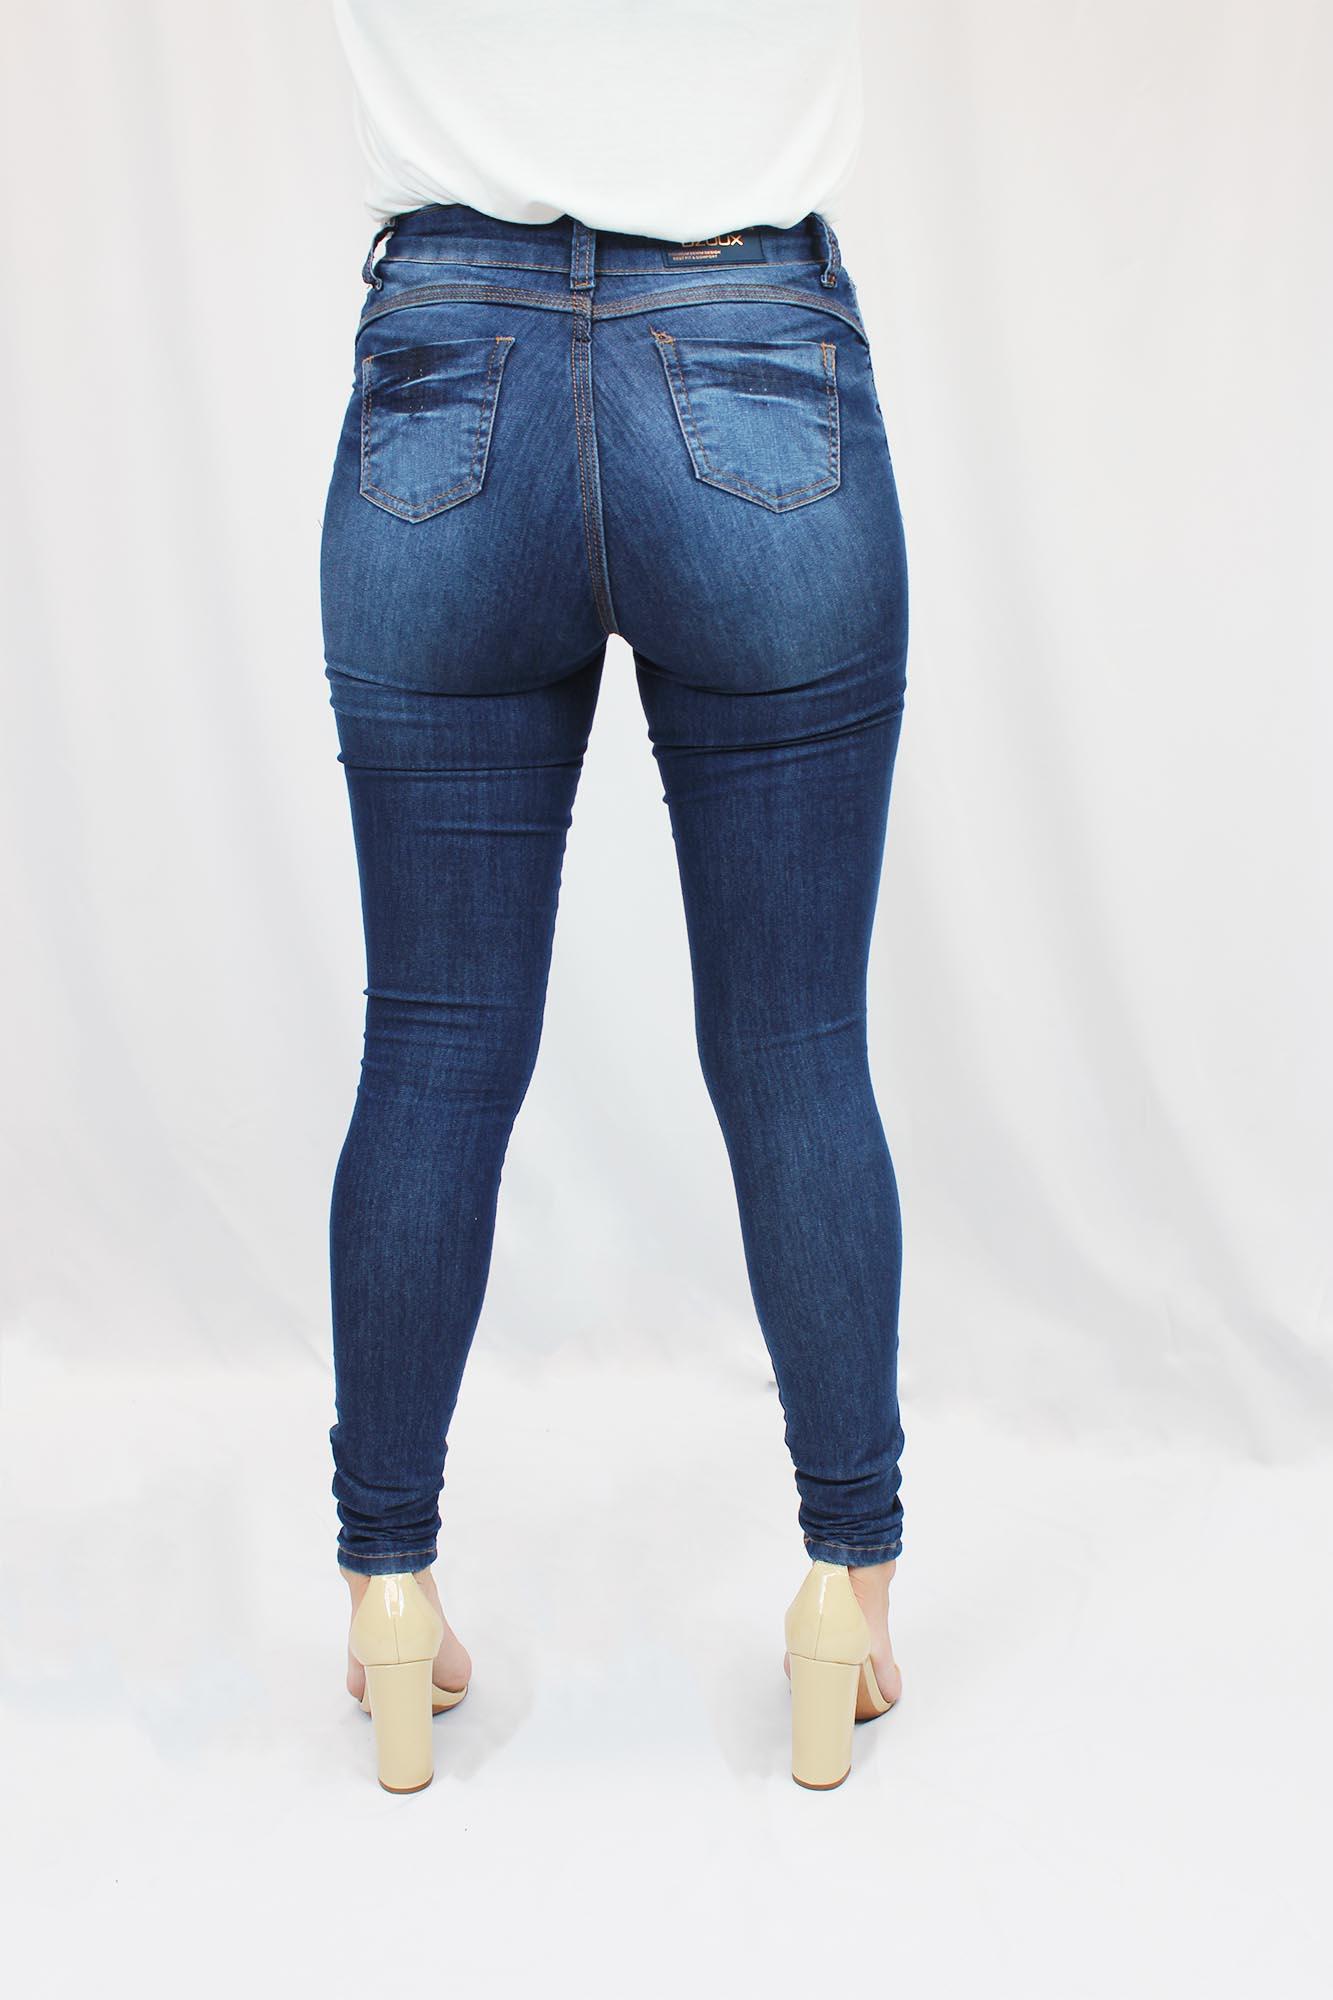 Calça Jeans Feminina - Detalhe Perna